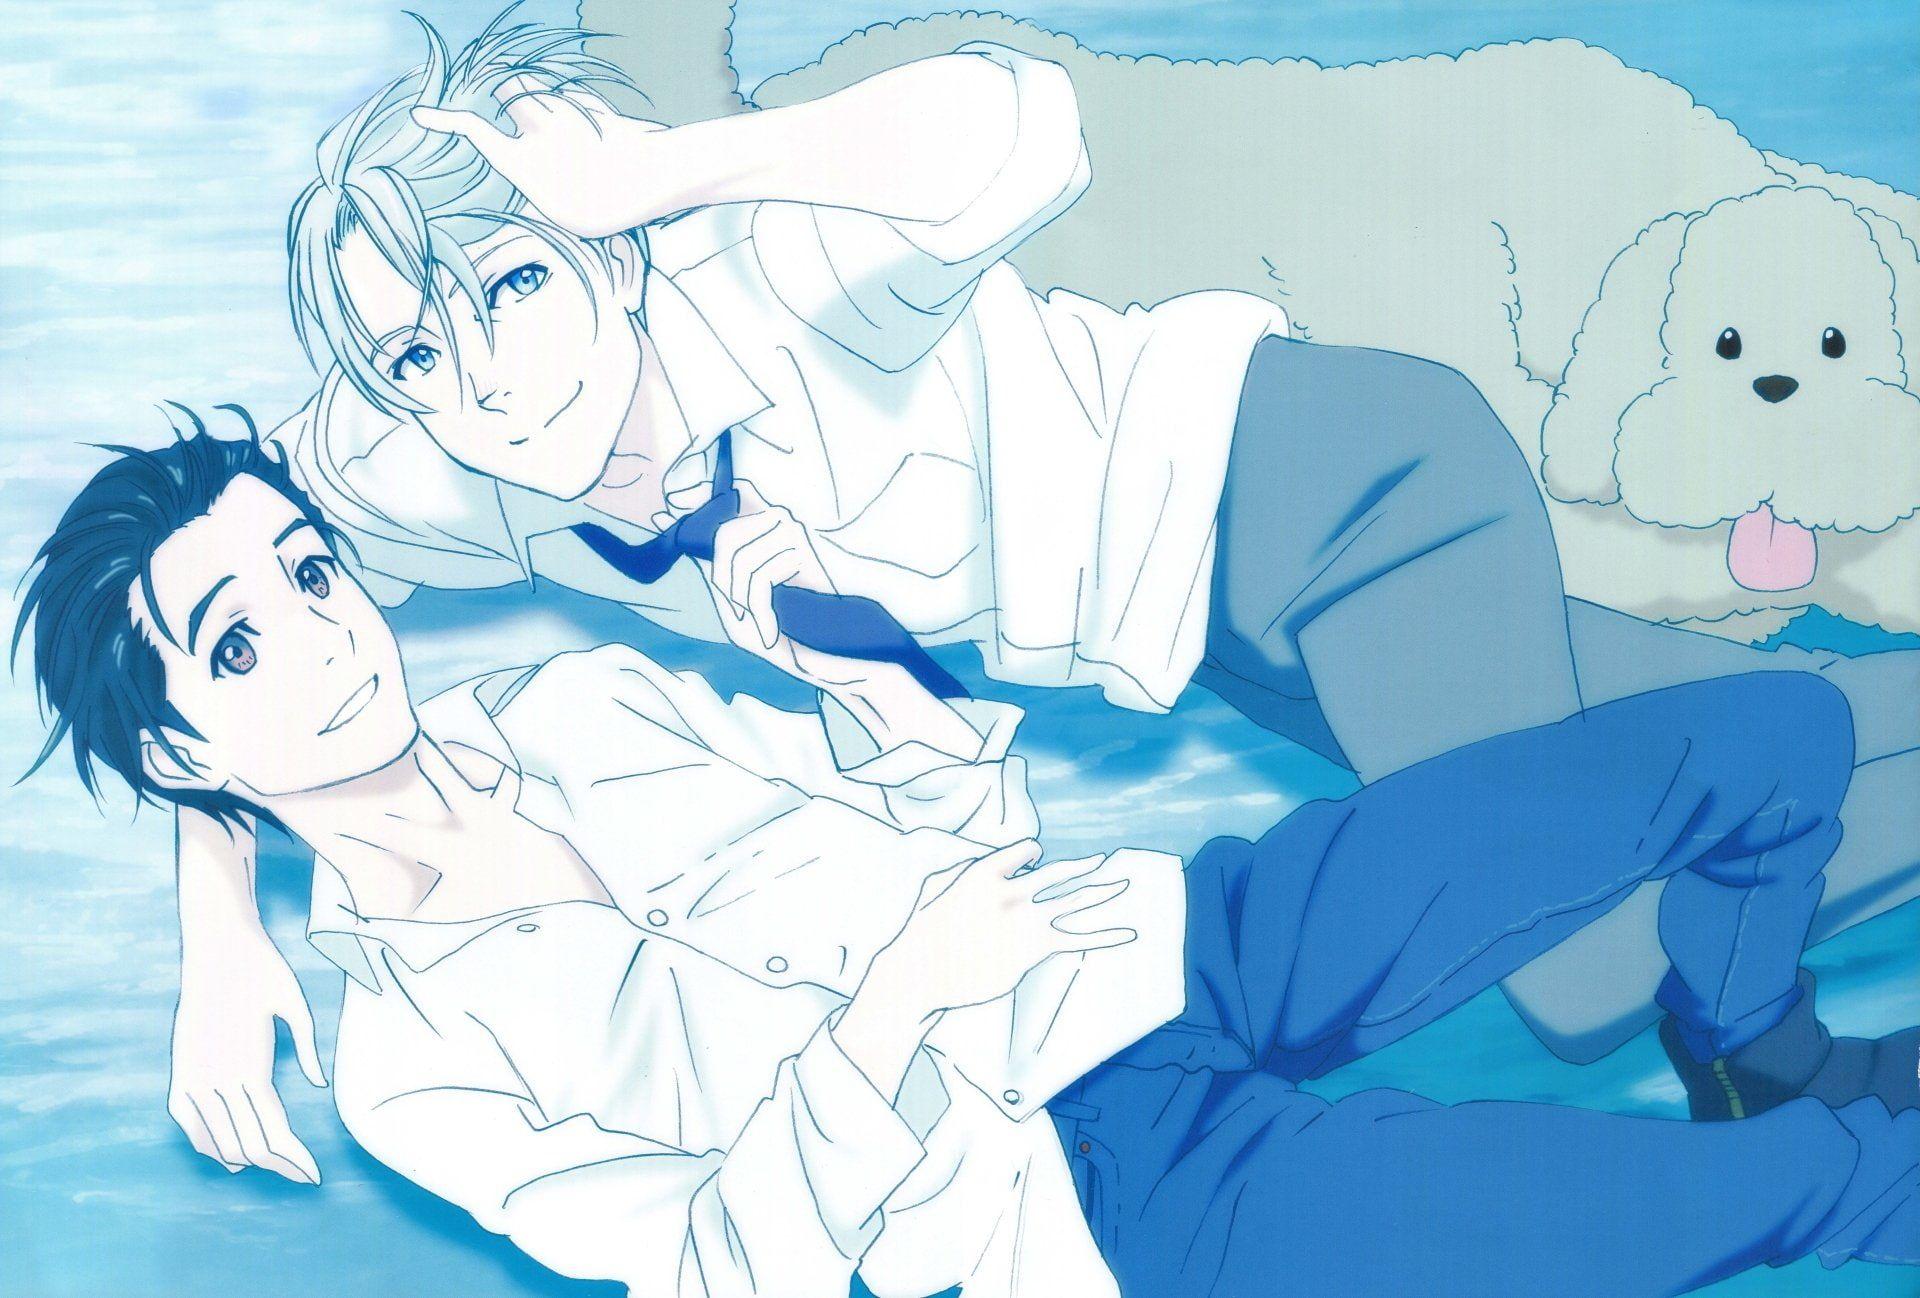 HD wallpaper: two anime men wallpaper, Yuri!!! on Ice